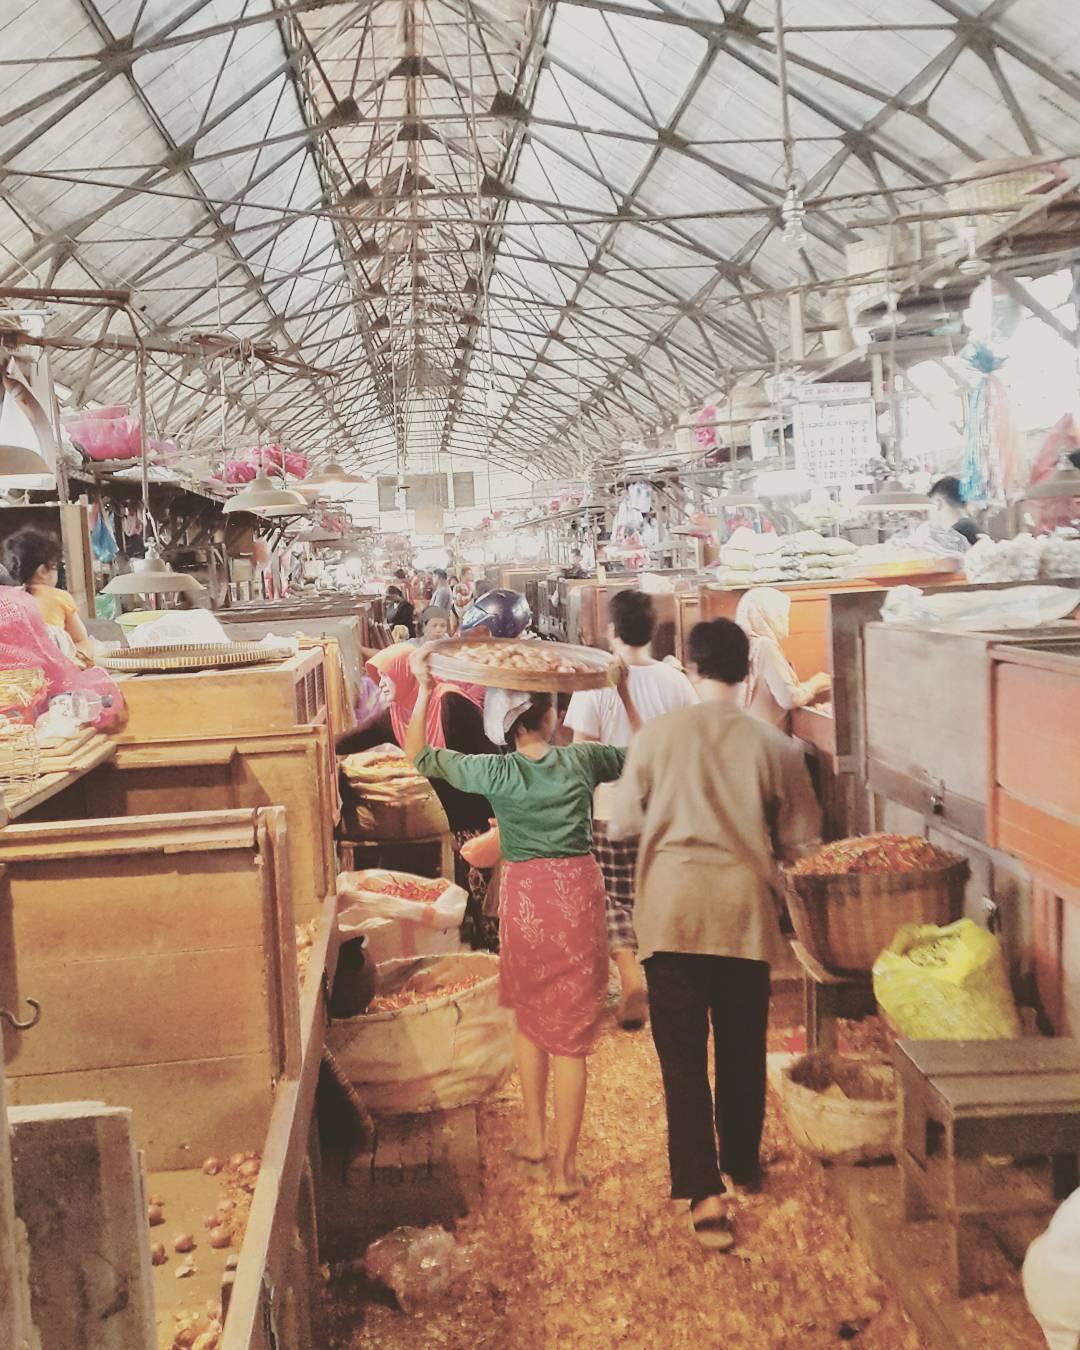 Belanja Grosir, Grosir Surabaya, Belanja di Surabaya, Dolan Dolen, Dolaners Belanja Grosir via dwikyap - Dolan Dolen